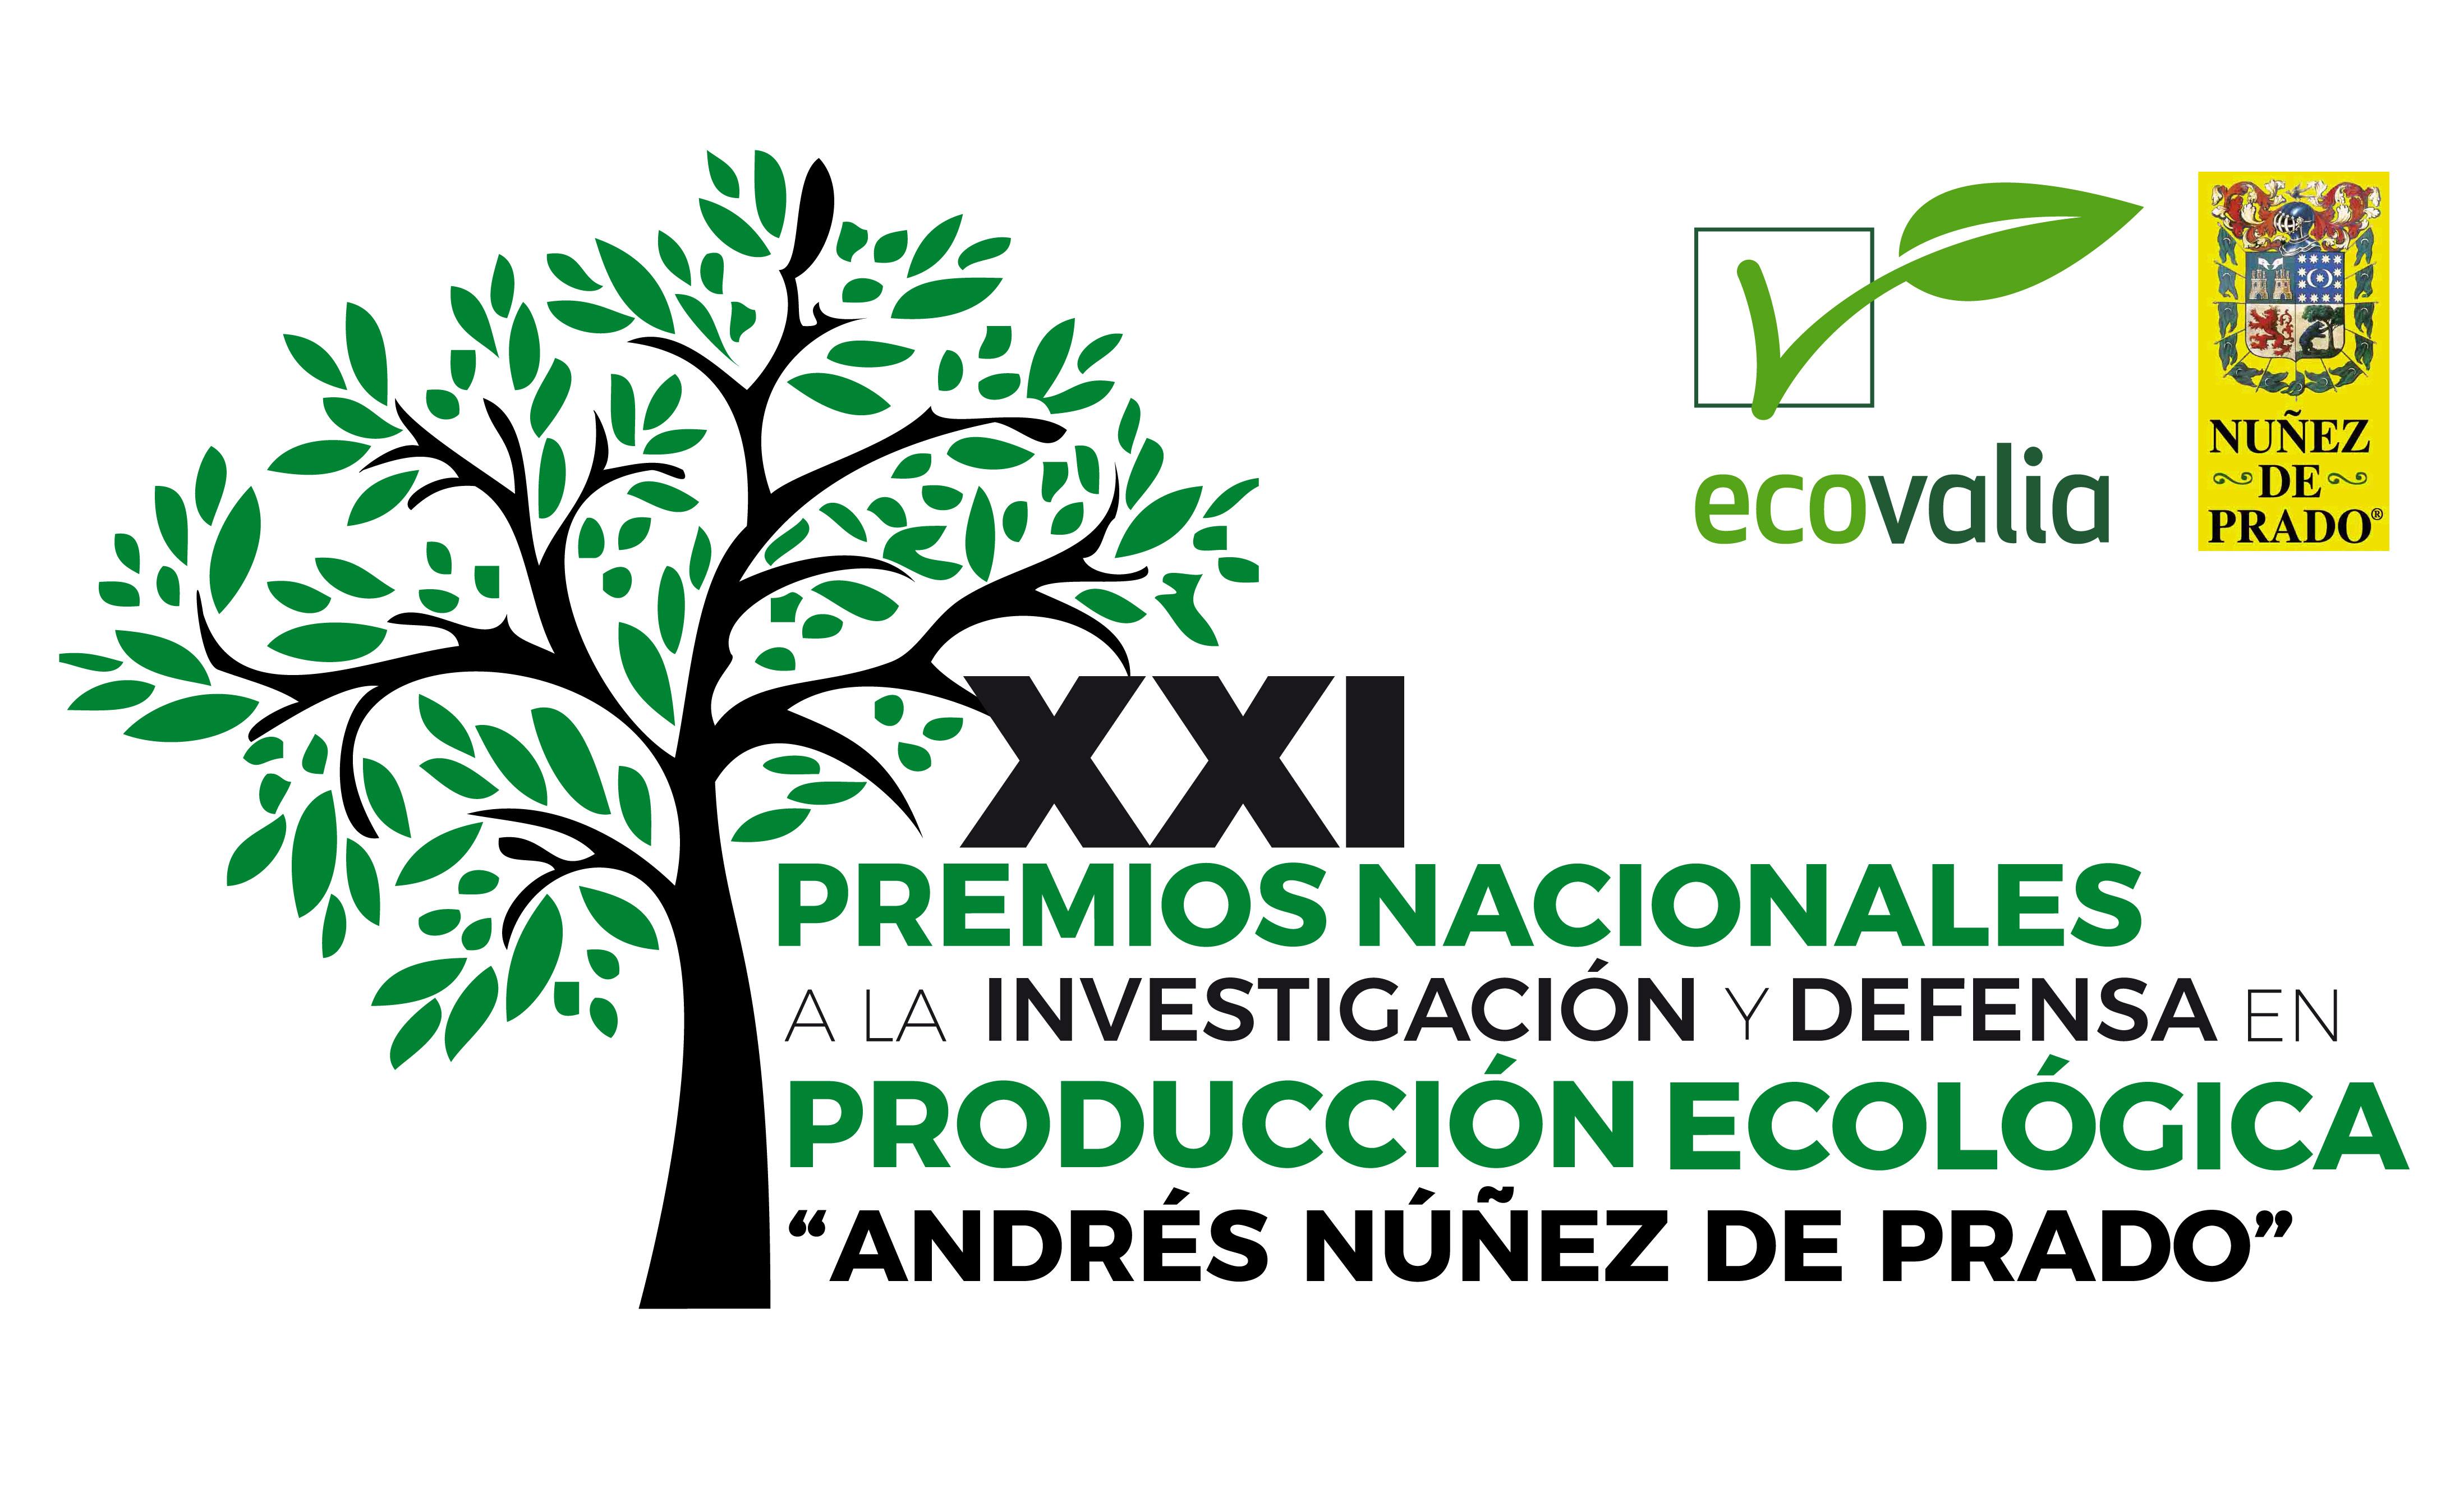 XXI PREMIOS NÚÑEZ DE PRADO